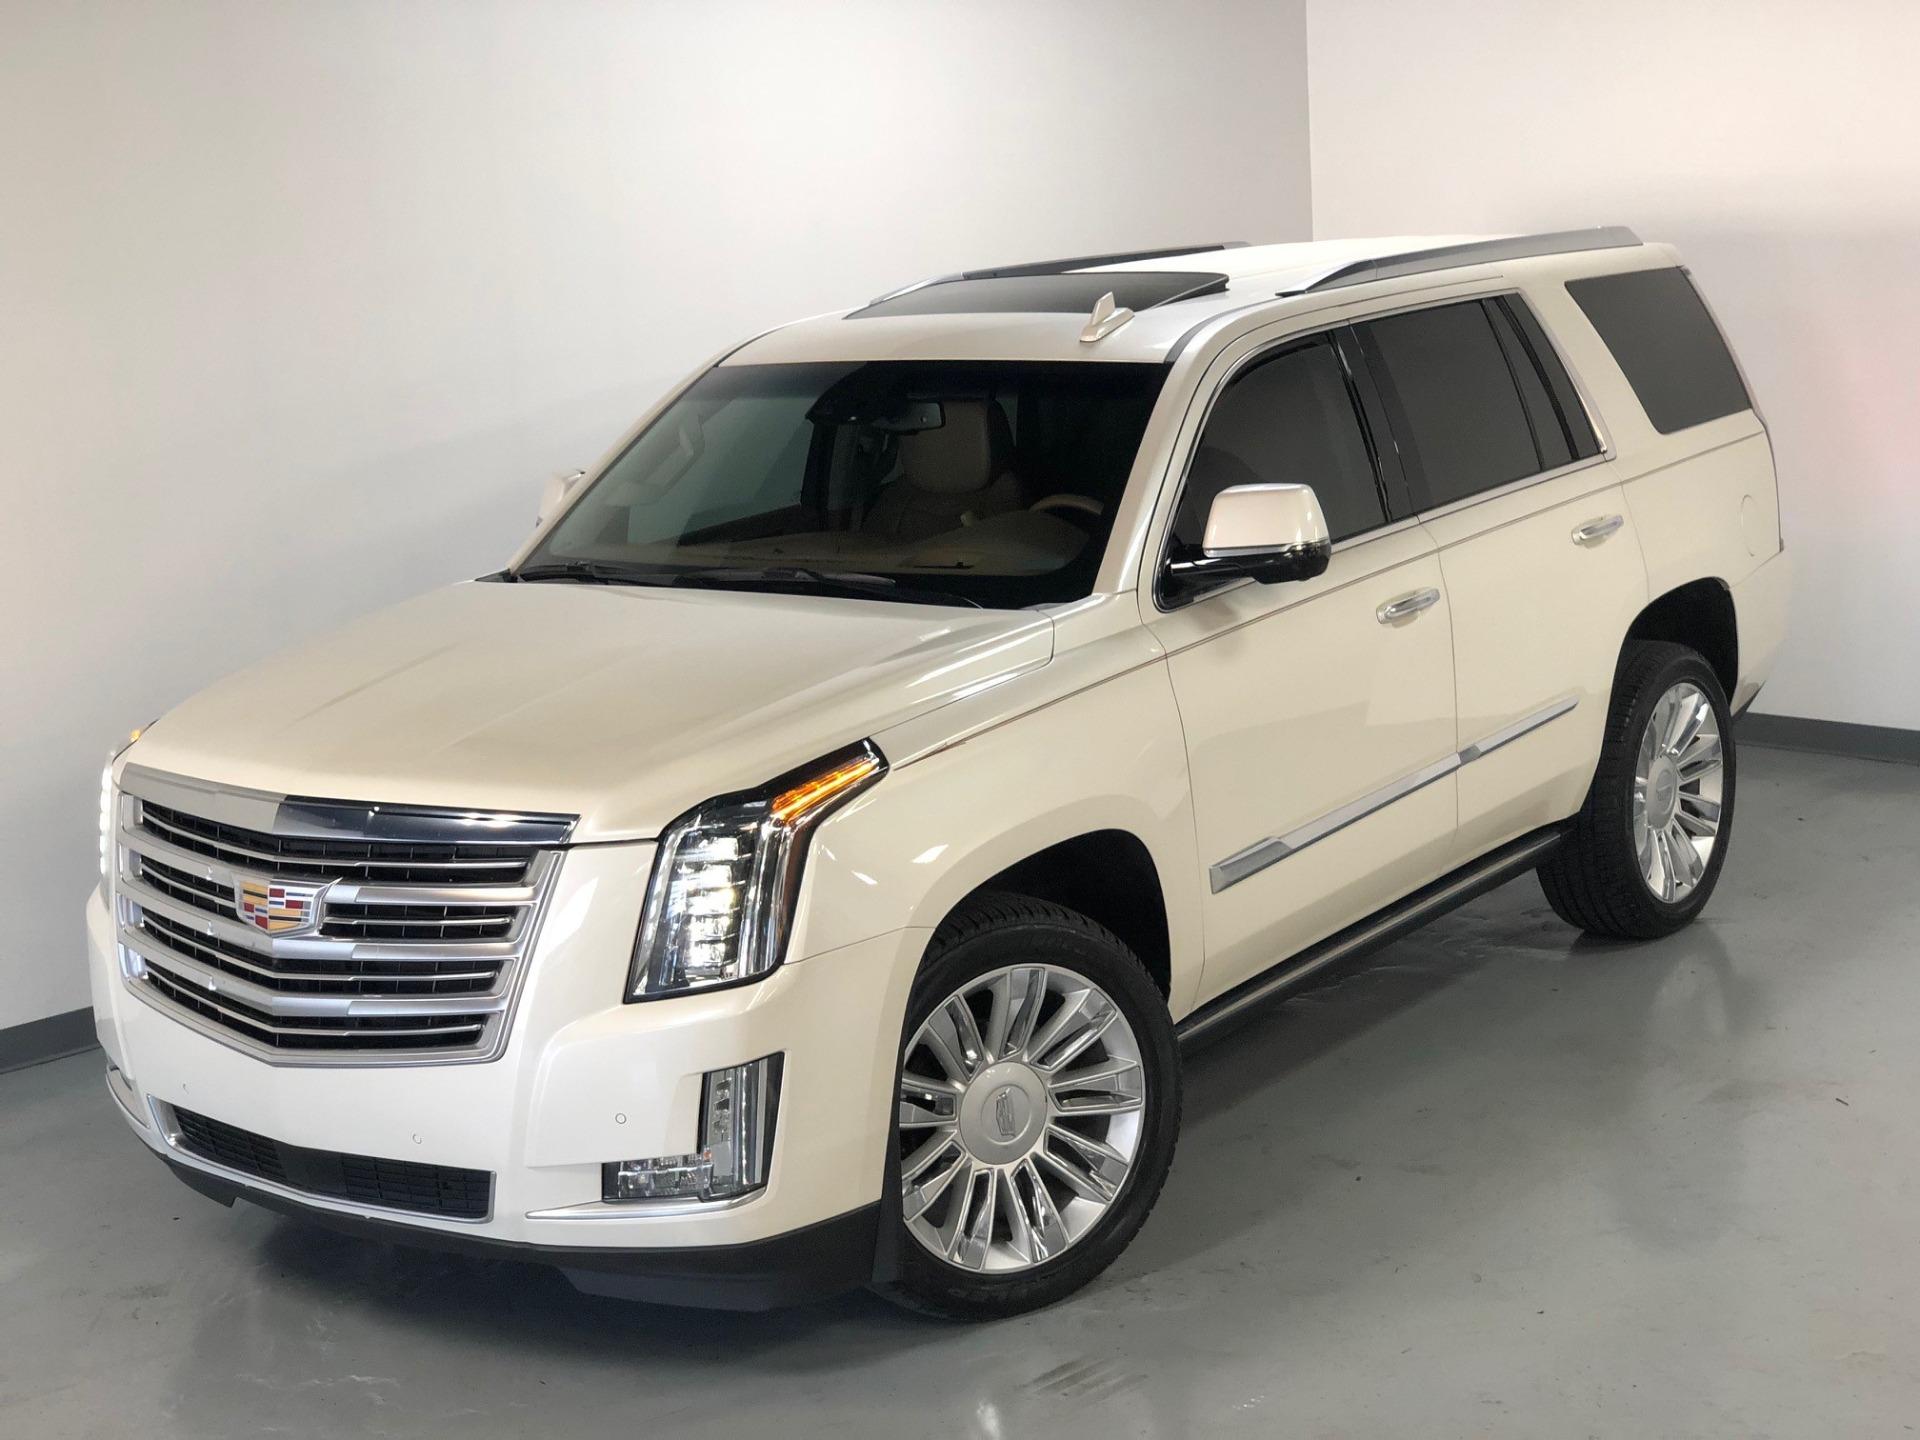 Used 2015 White Diamond Tricoat Cadillac Escalade Platinum Awd Platinum For Sale Sold Prime Motorz Stock 2761